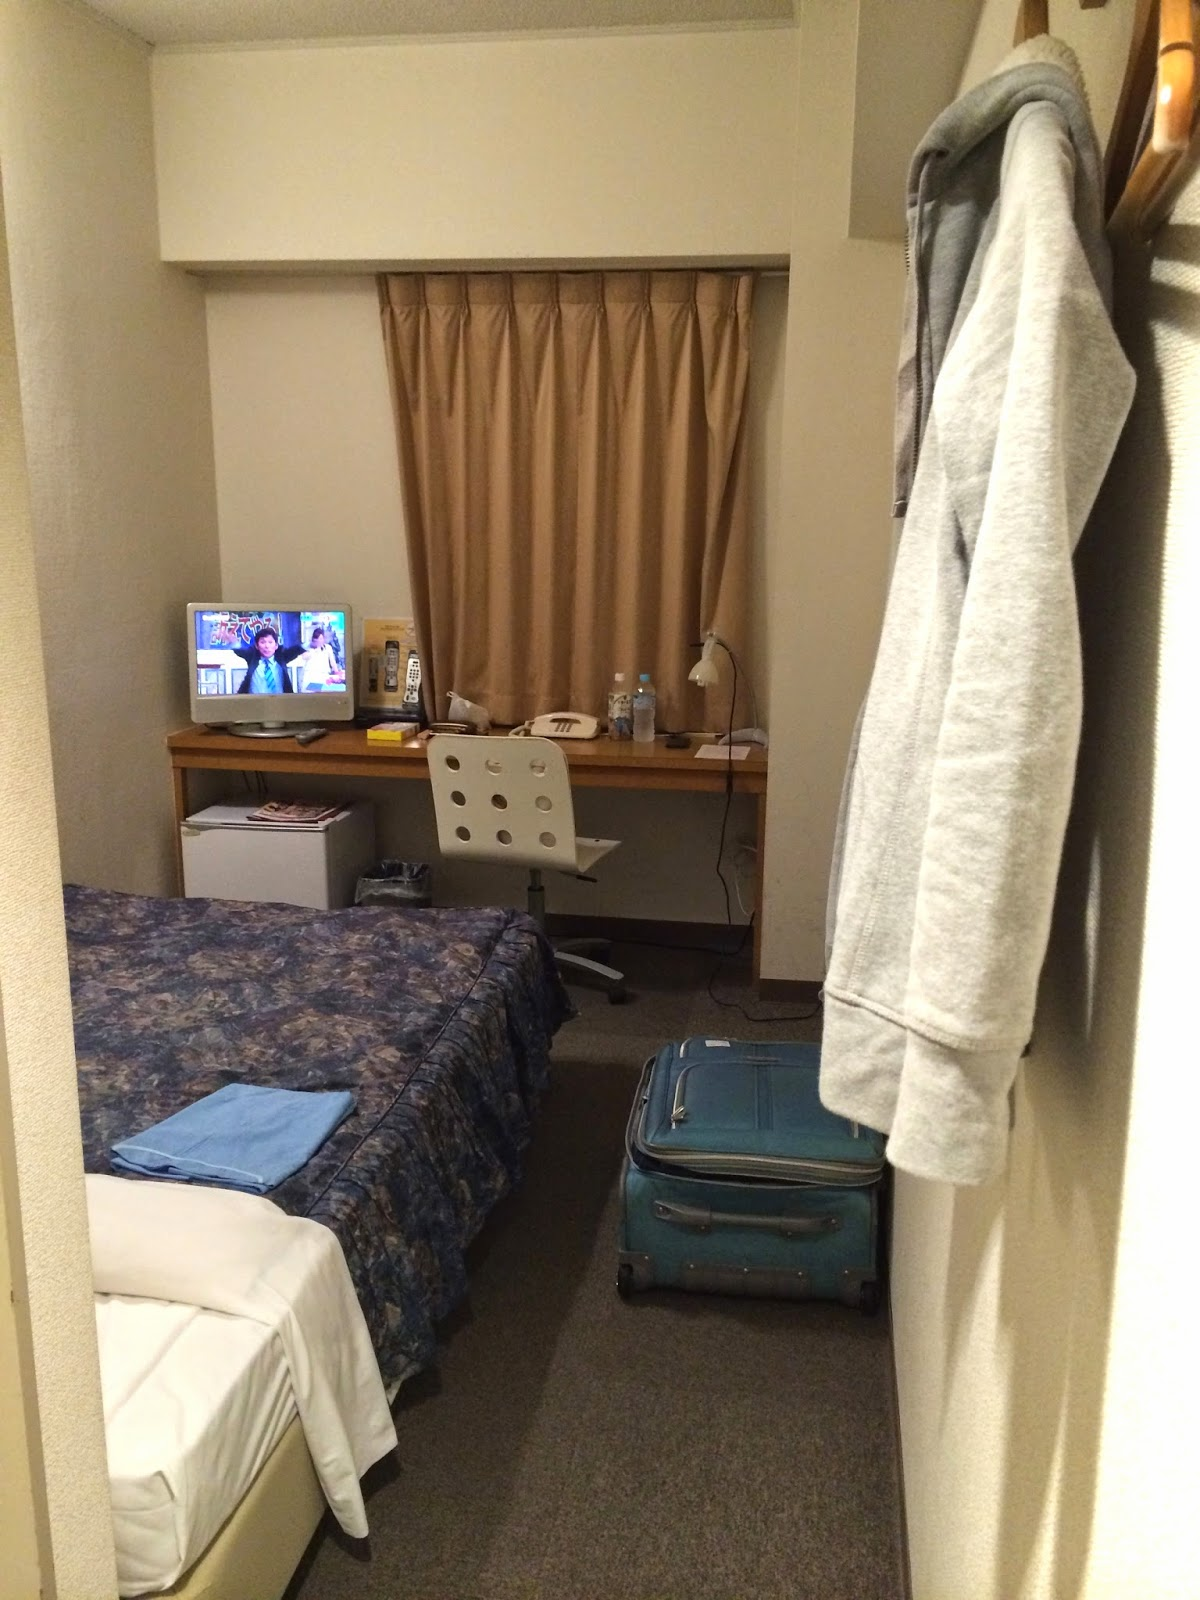 https://www.google.com.sg/search?client=safari&rls=en&q=sakura+hotel+ikebukuro&ie=UTF-8&oe=UTF-8&gfe_rd=cr&ei=_35YVIbbMsiCuAT4koHgAg#rls=en&q=sakura+hotel+ikebukuro+review